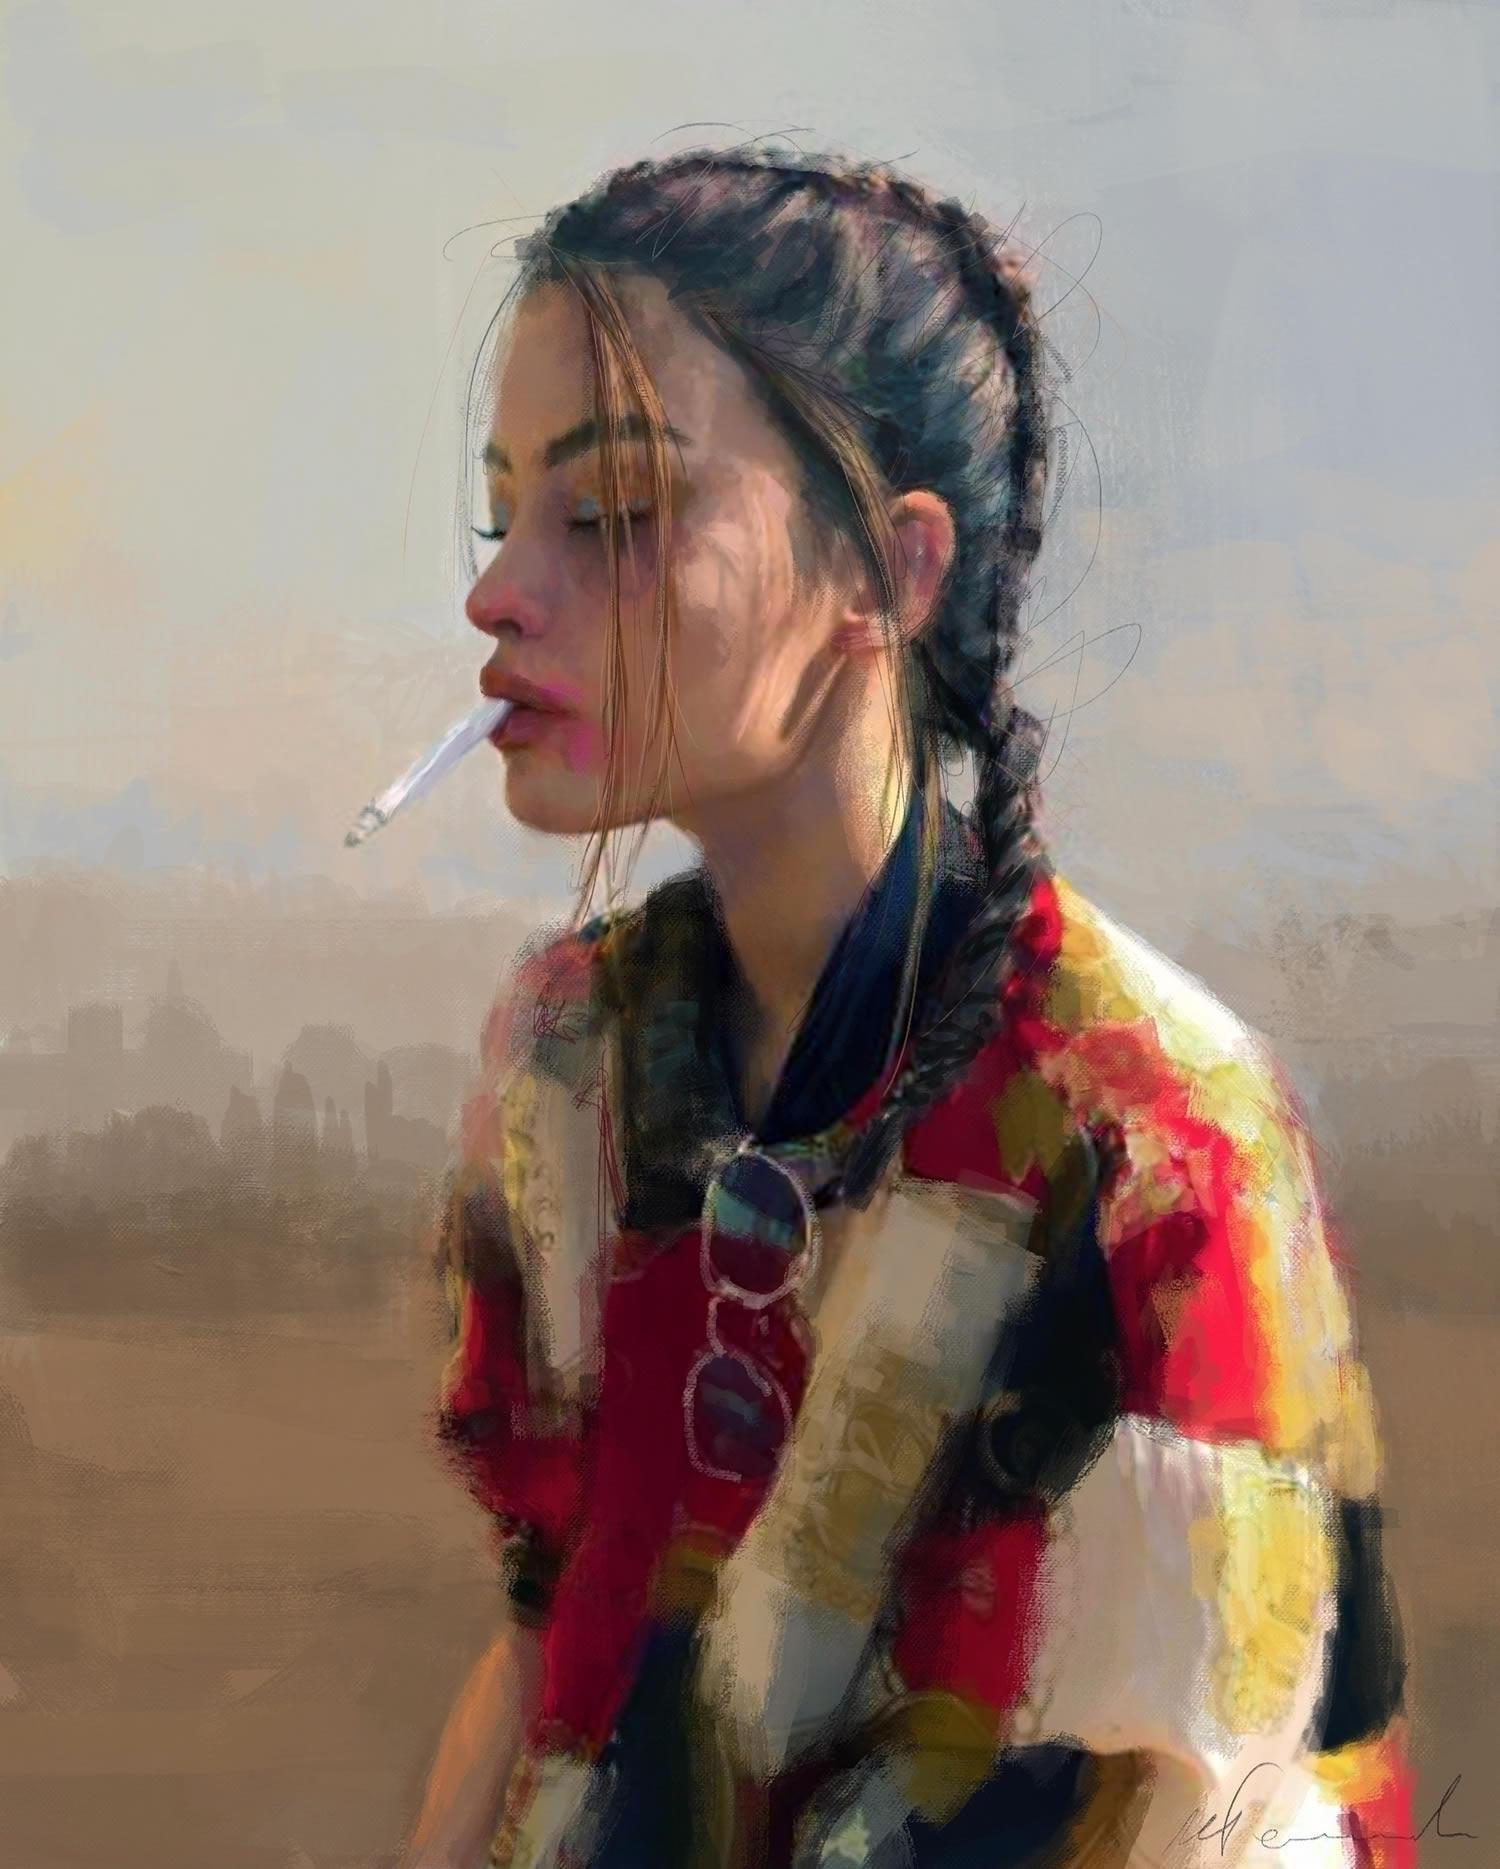 girl smoking, sunset, portrait